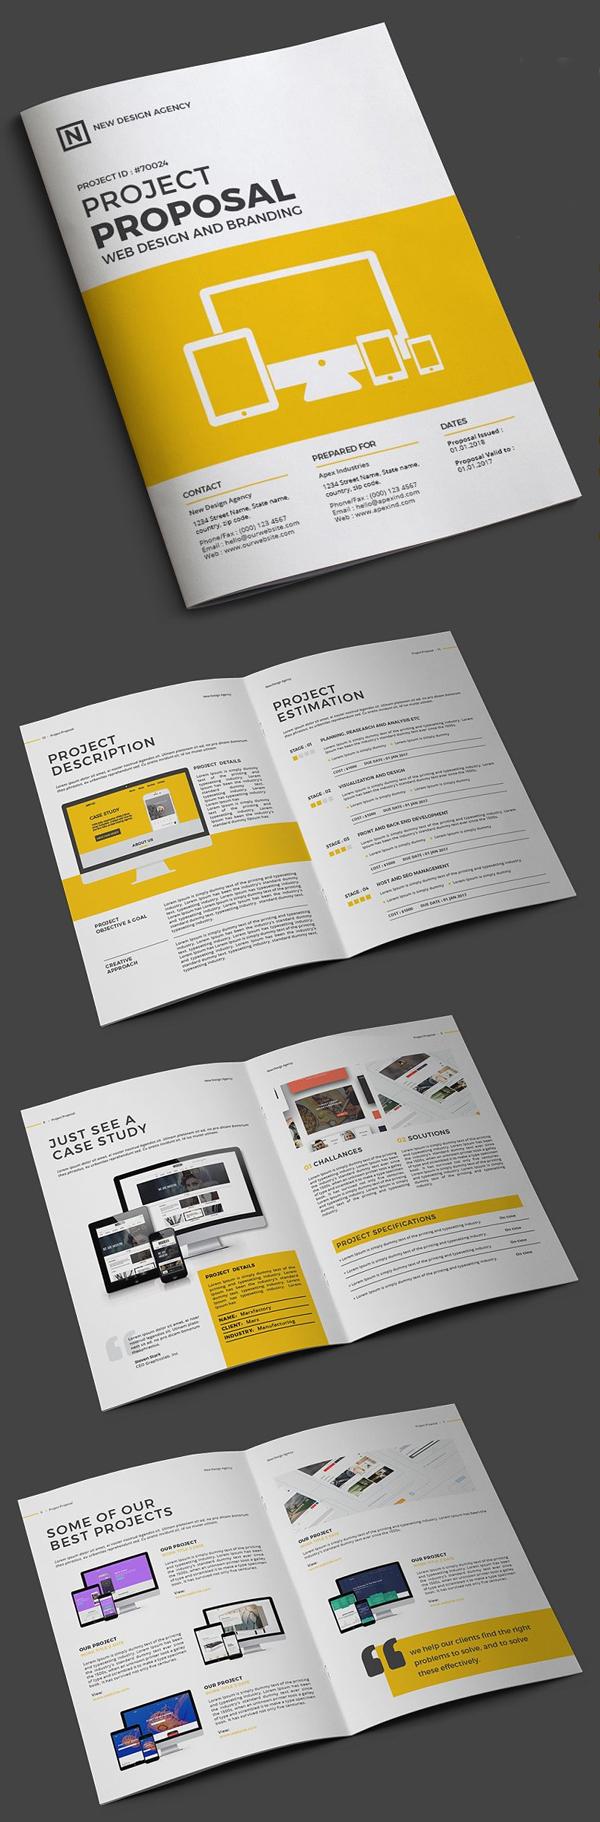 Project Proposal for Website Design